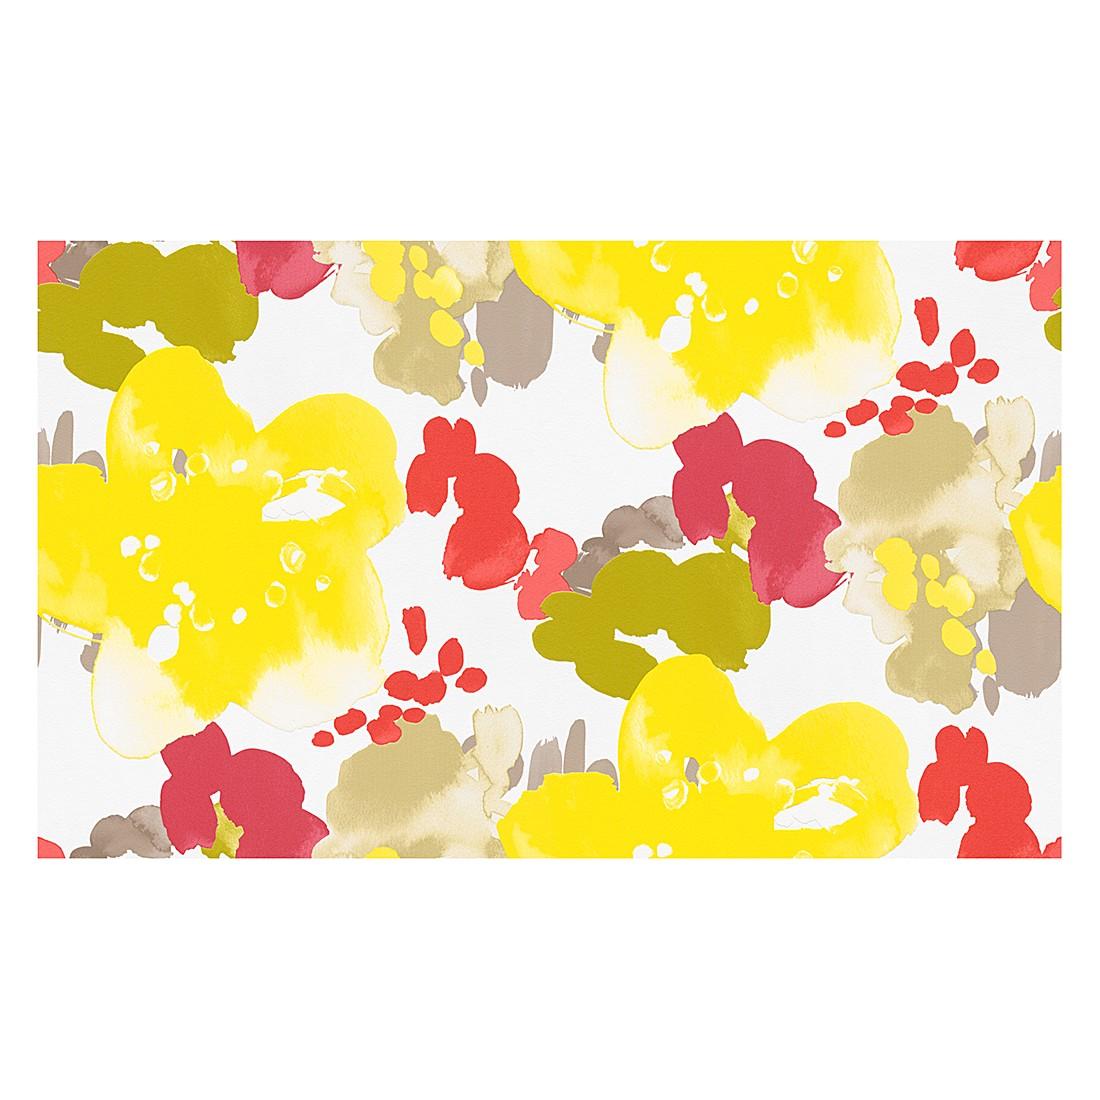 Tapete Buenos Aires – signalweiß, zinkgelb, farngrün, erbeerrot, reinrot, khakigrau, graubeige – strukturiert – fein strukturiert – glatt, Esprit Home online bestellen